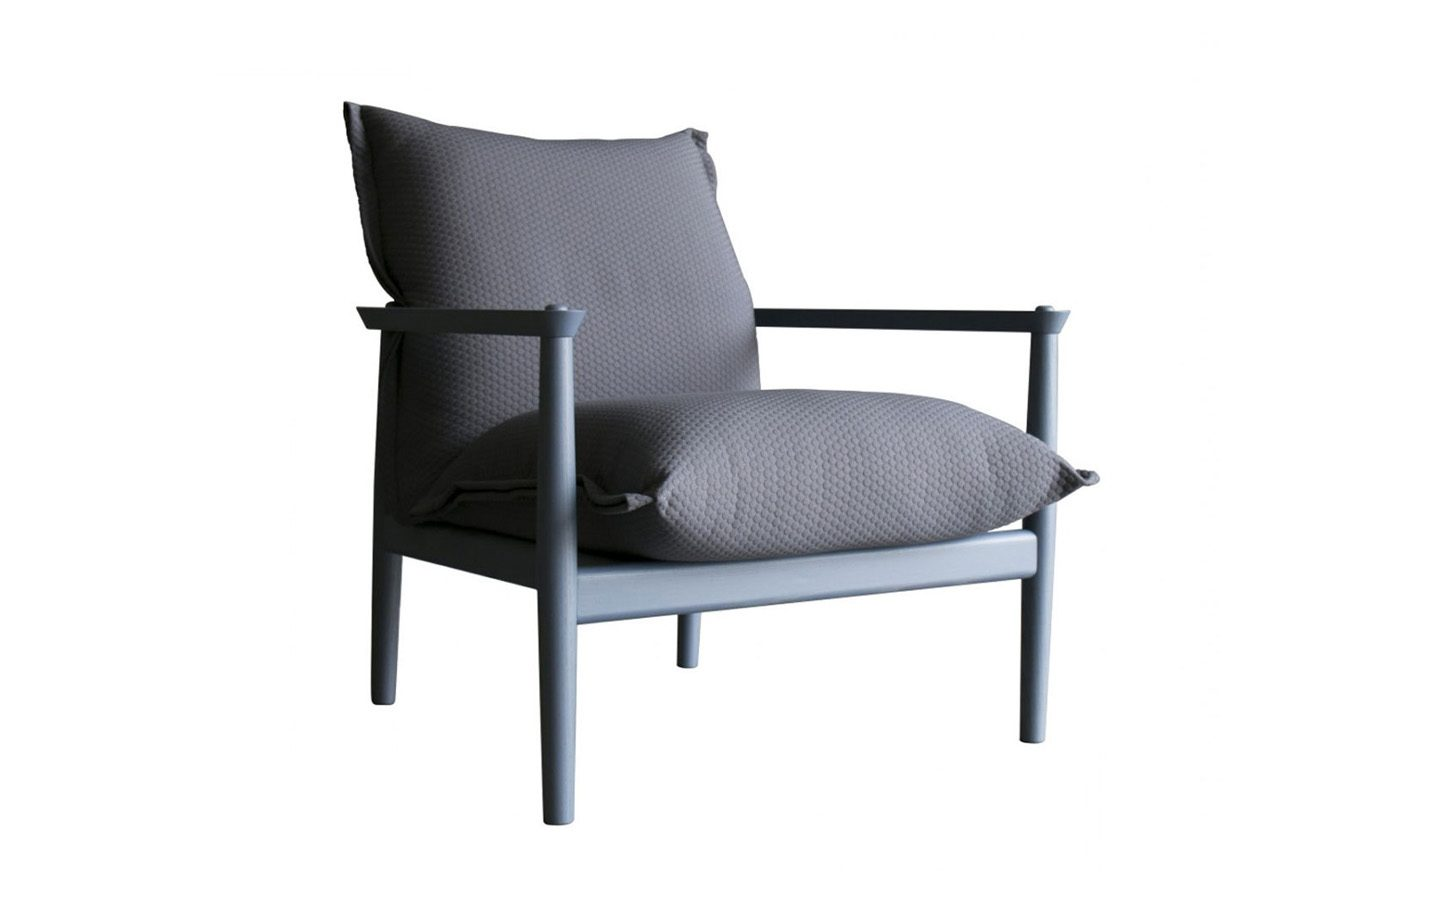 Sergia-designer-lounge-Armchair-wood-04